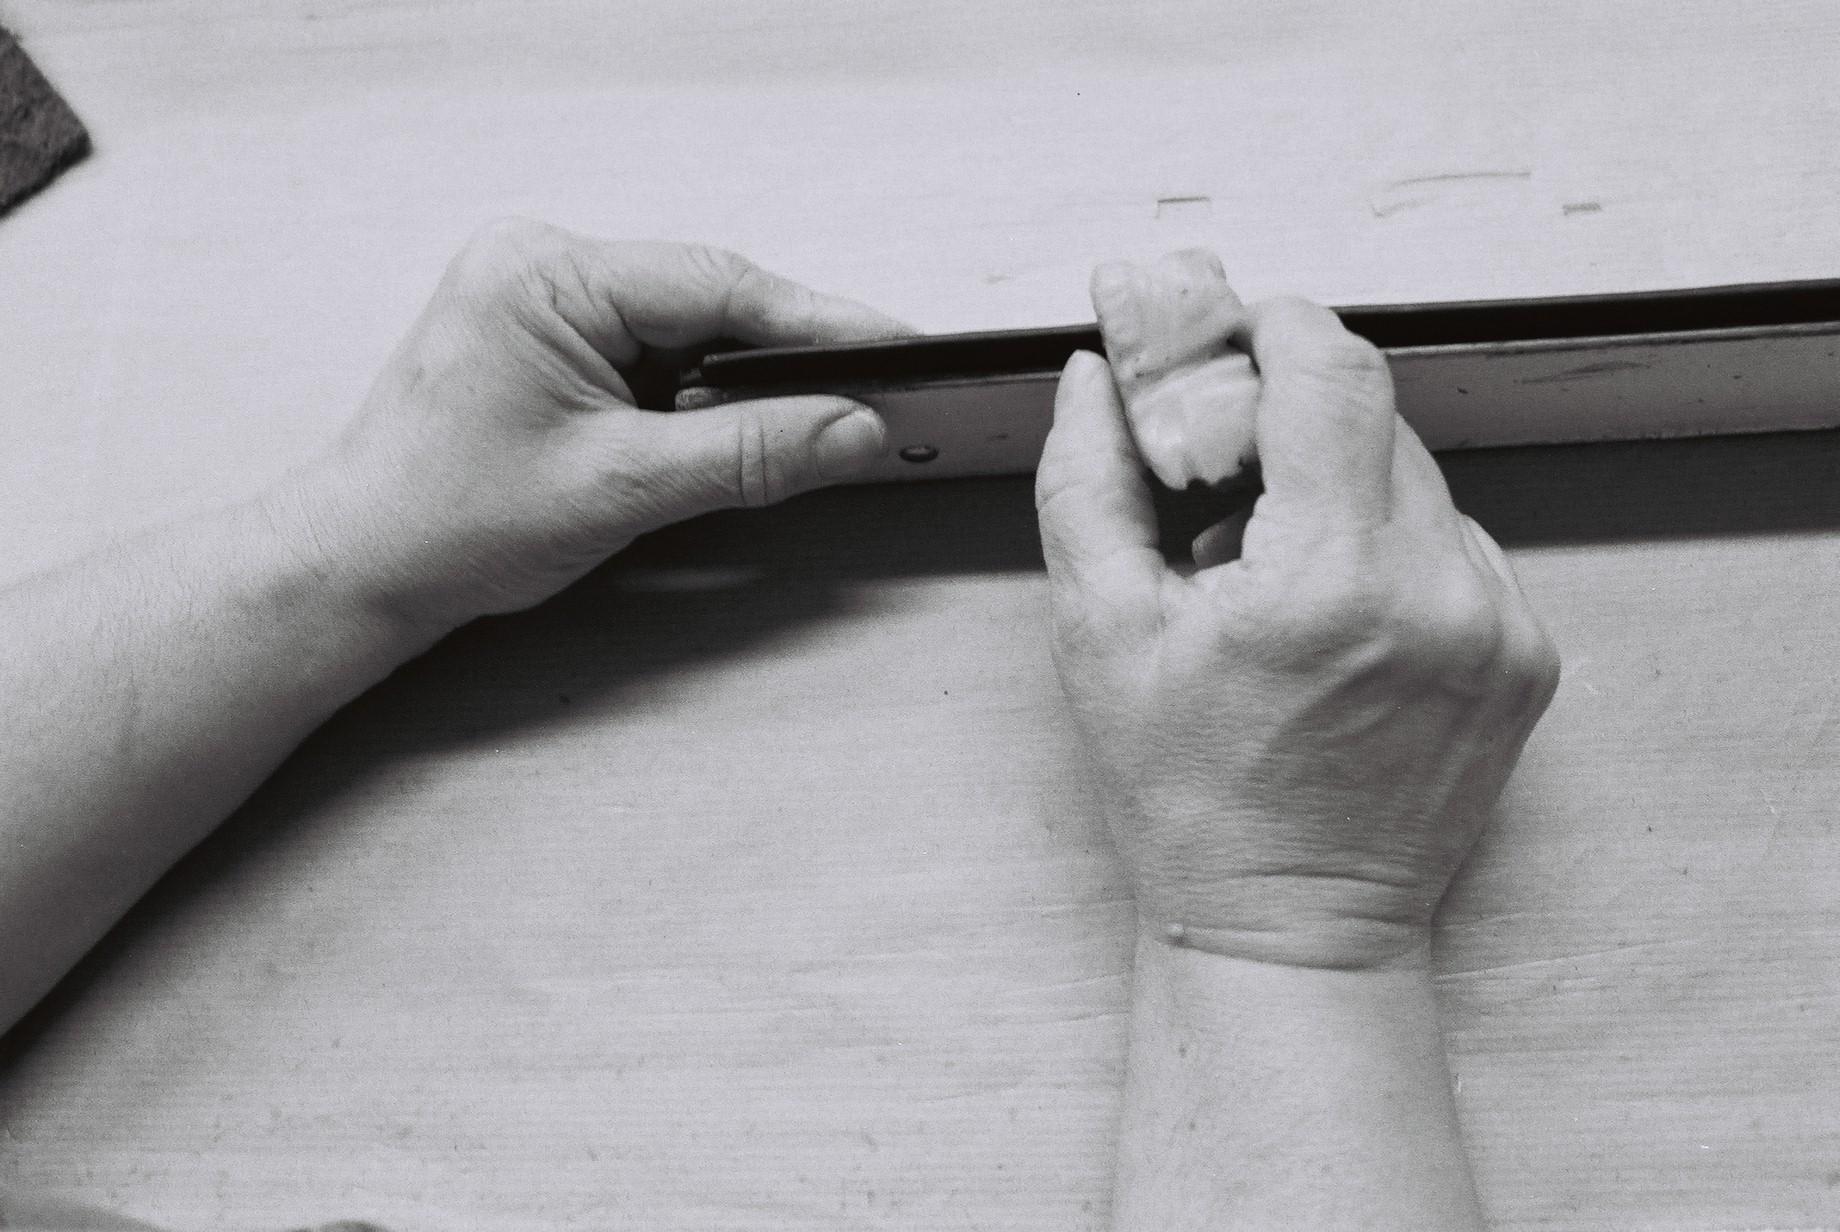 Artling_Ceinture sur mesure_Processus de fabrication_7